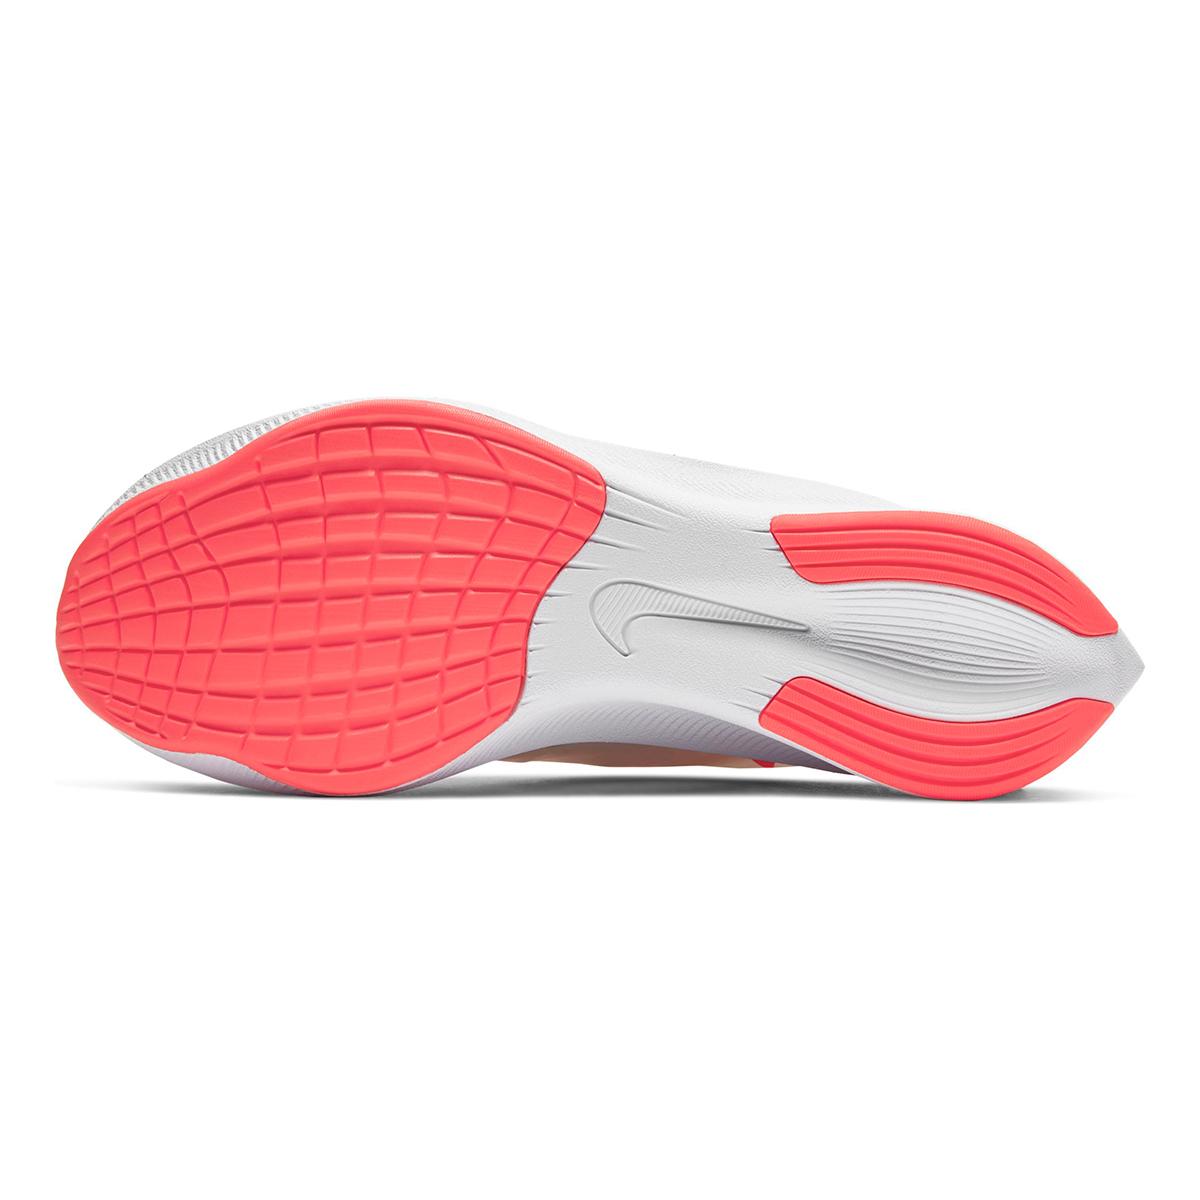 Women's Nike Zoom Fly 3 Running Shoes - Color: White/Laser Crimson/Summit White - Size: 5 - Width: Regular, White/Laser Crimson/Summit White, large, image 3